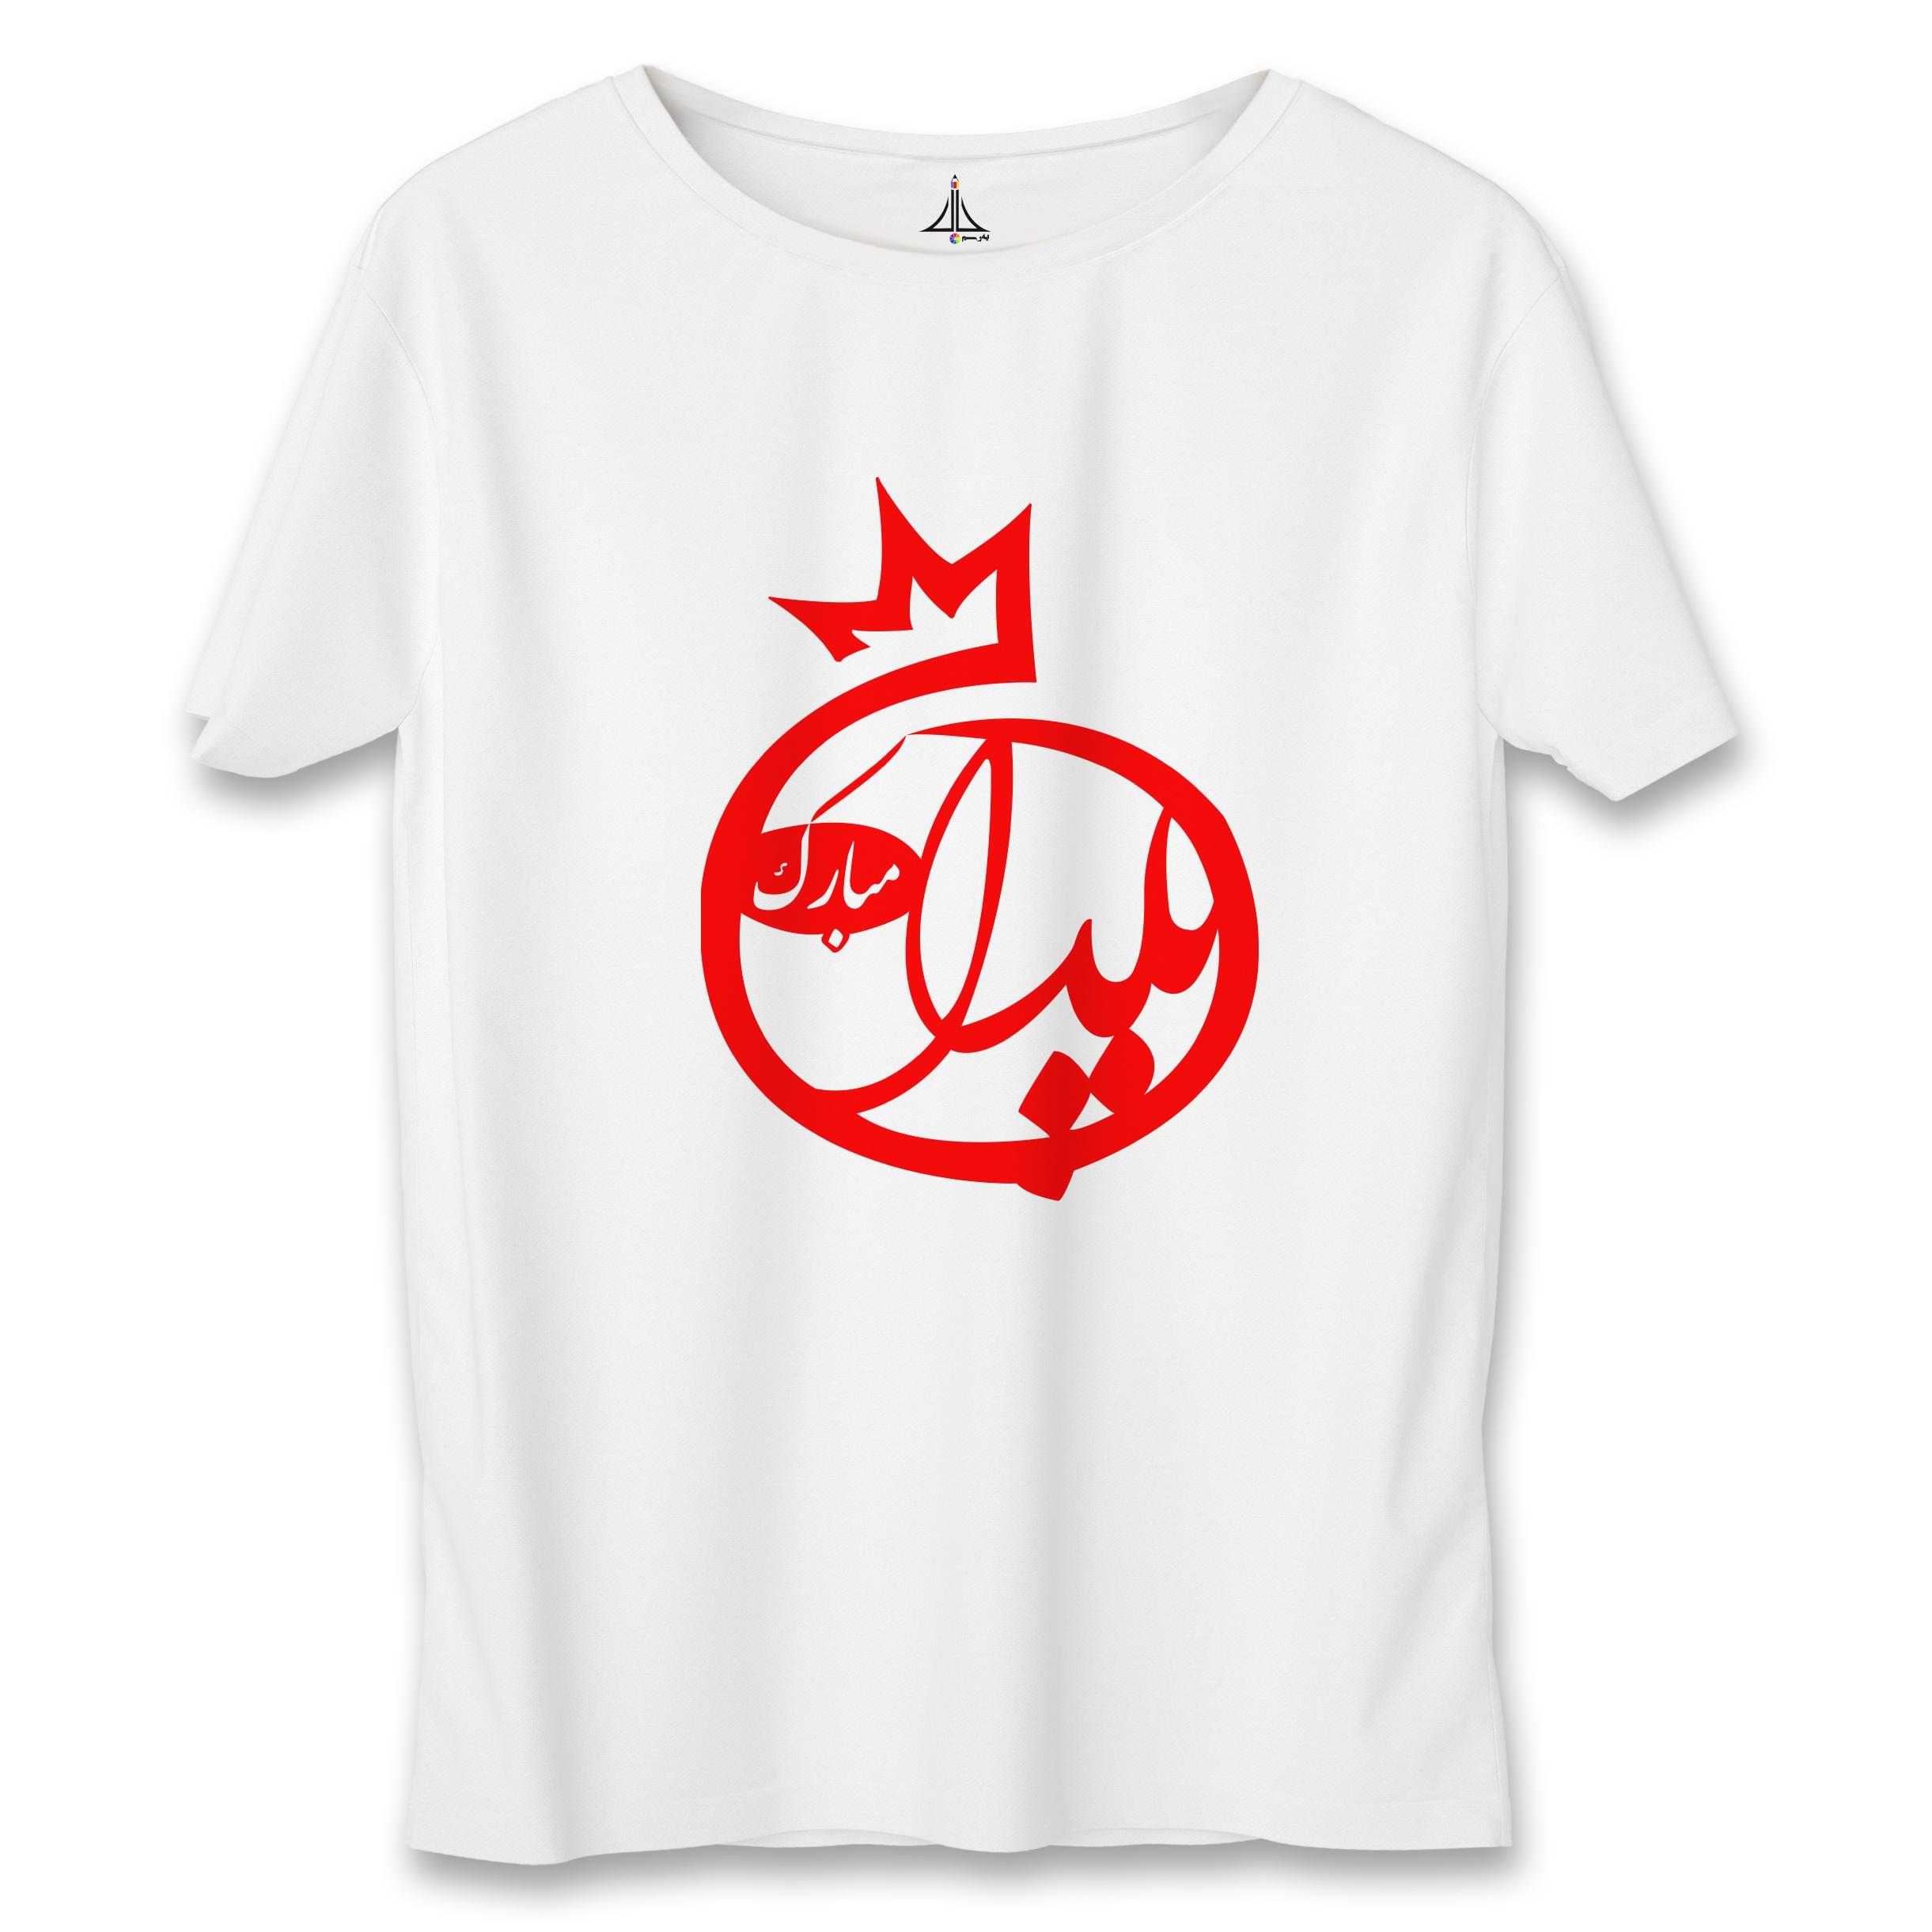 تی شرت زنانه به رسم طرح یلدا کد 5560